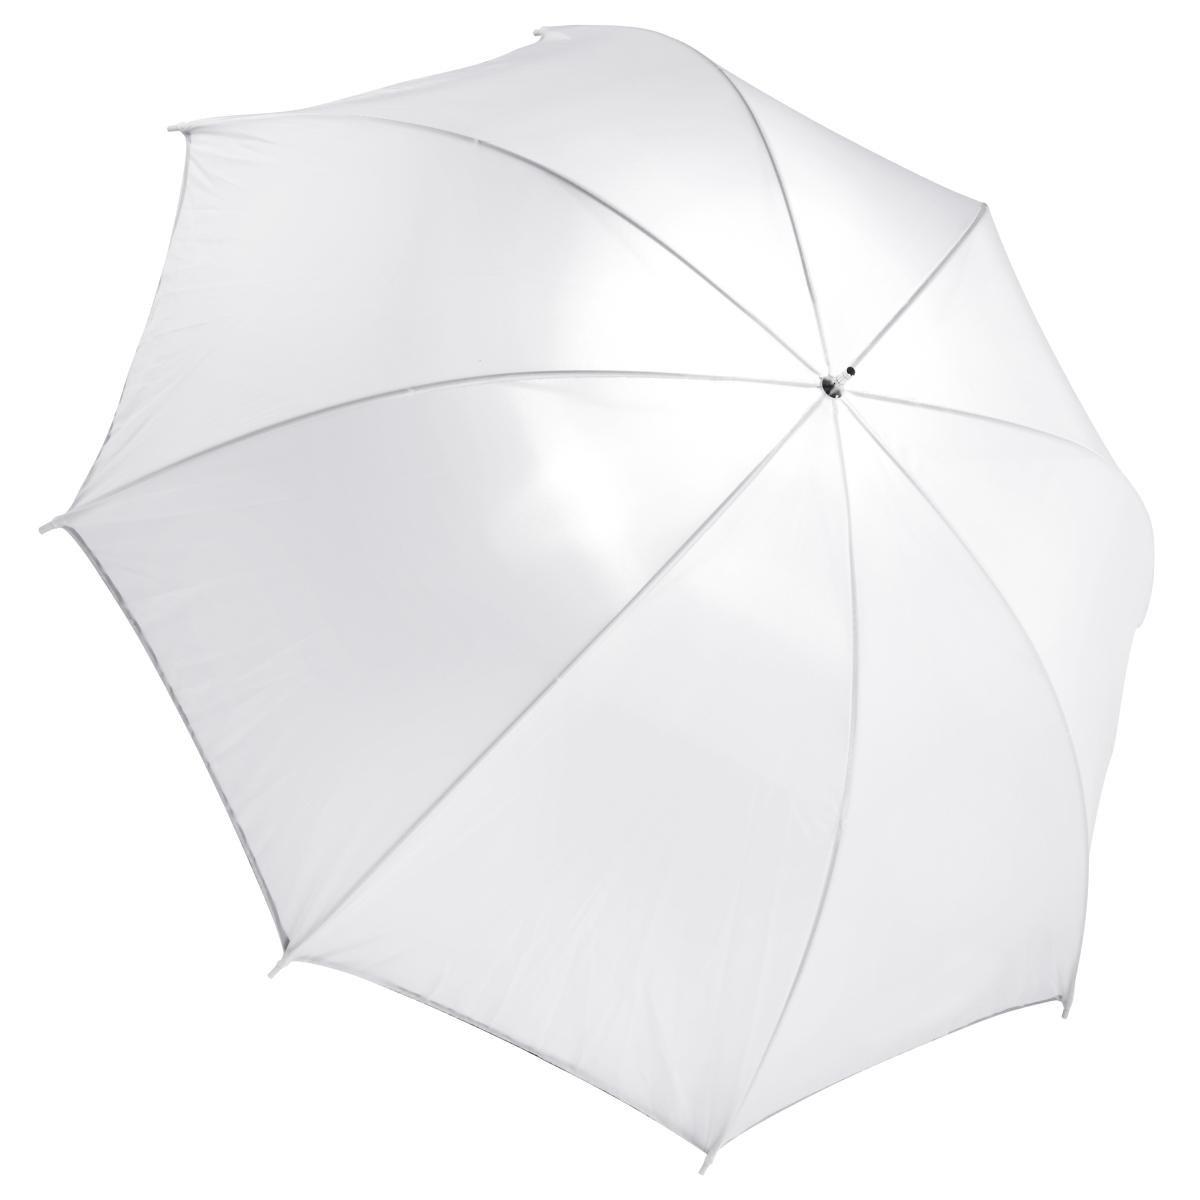 Walimex Pro Translucent Umbrella softbox 109 cm by Walimex Pro (Image #2)